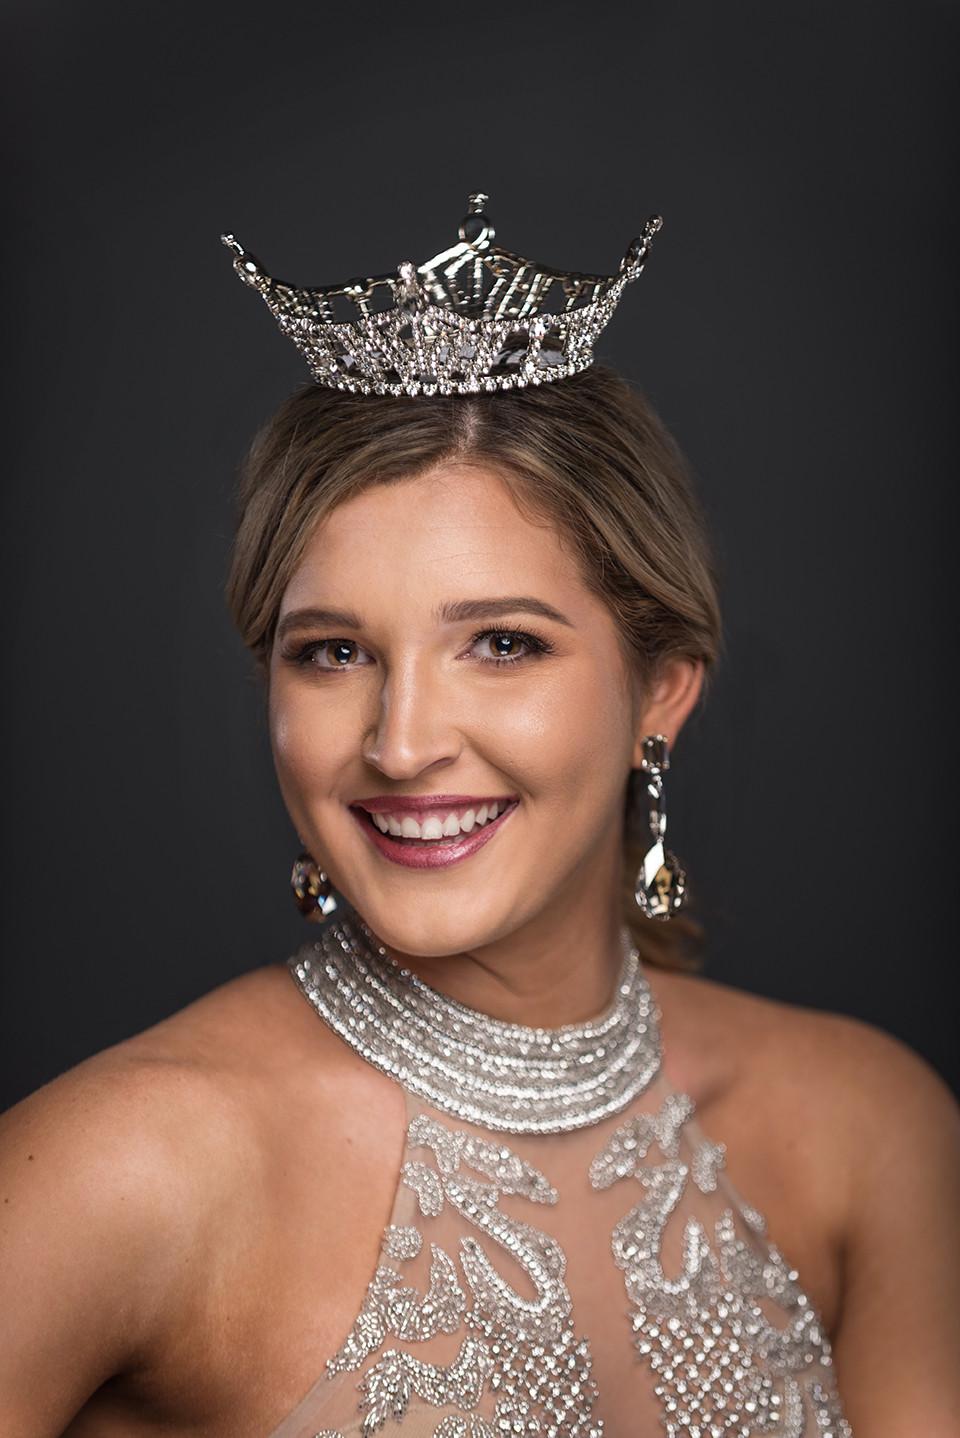 Miss SWOSU Natalee Karcher. Photo: provided.